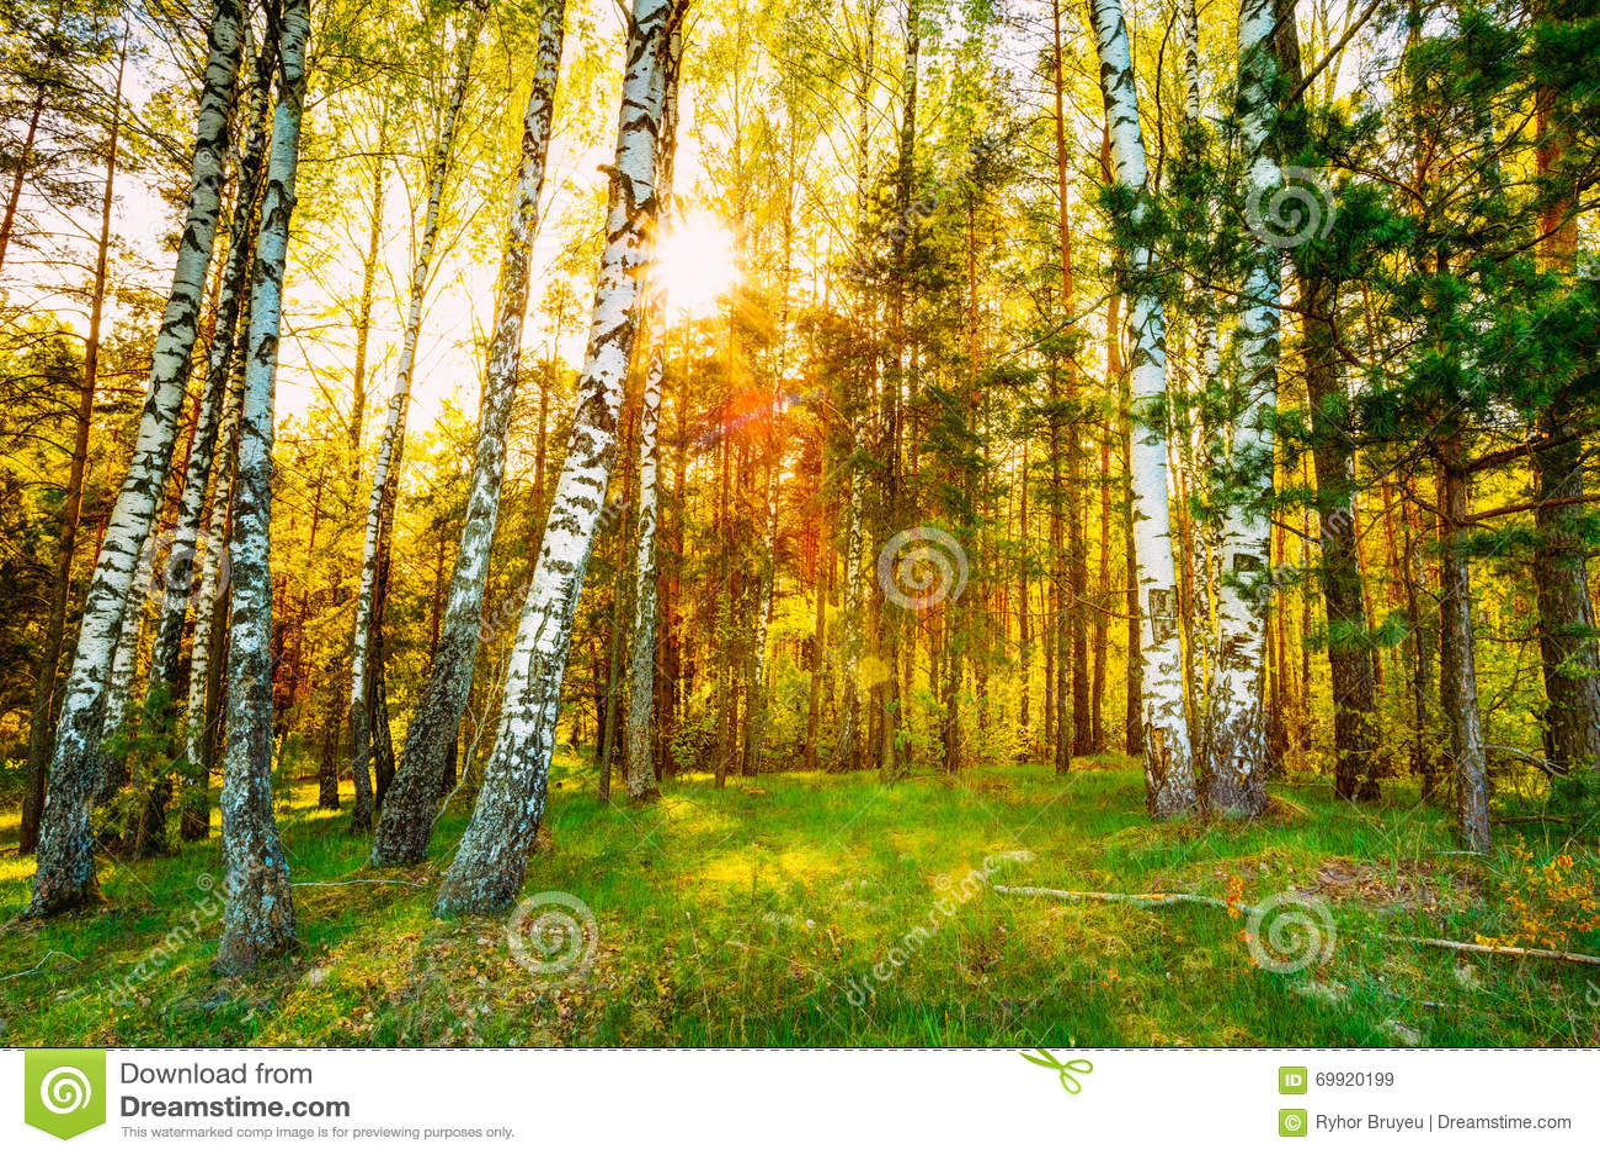 Nascer do sol do por do sol da luz do sol no vidoeiro bonito Forest In Summer Seas